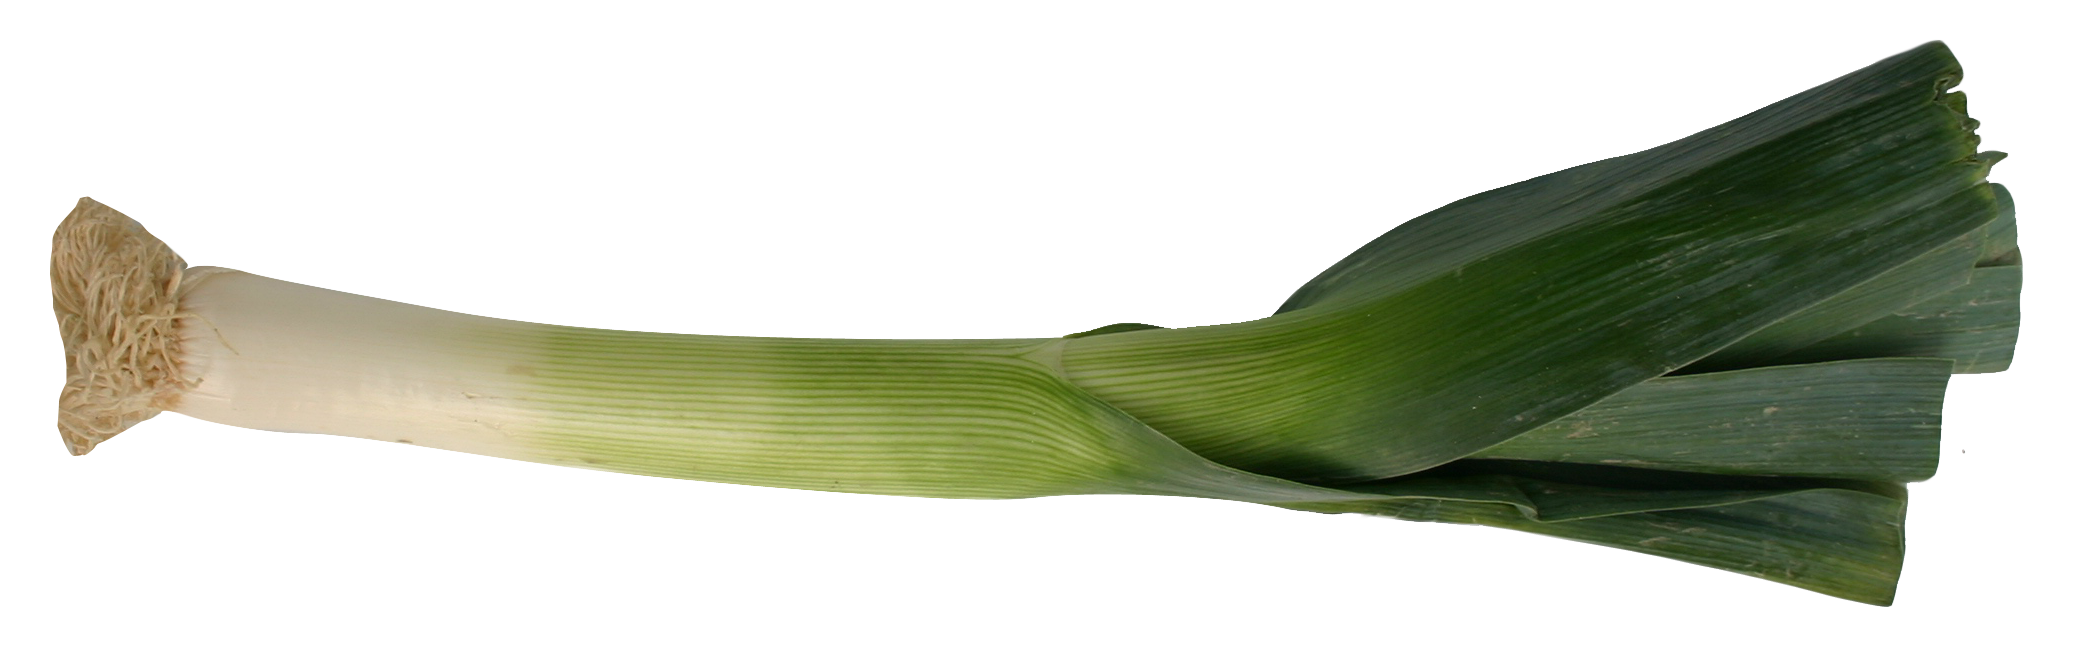 Leek PNG Image.